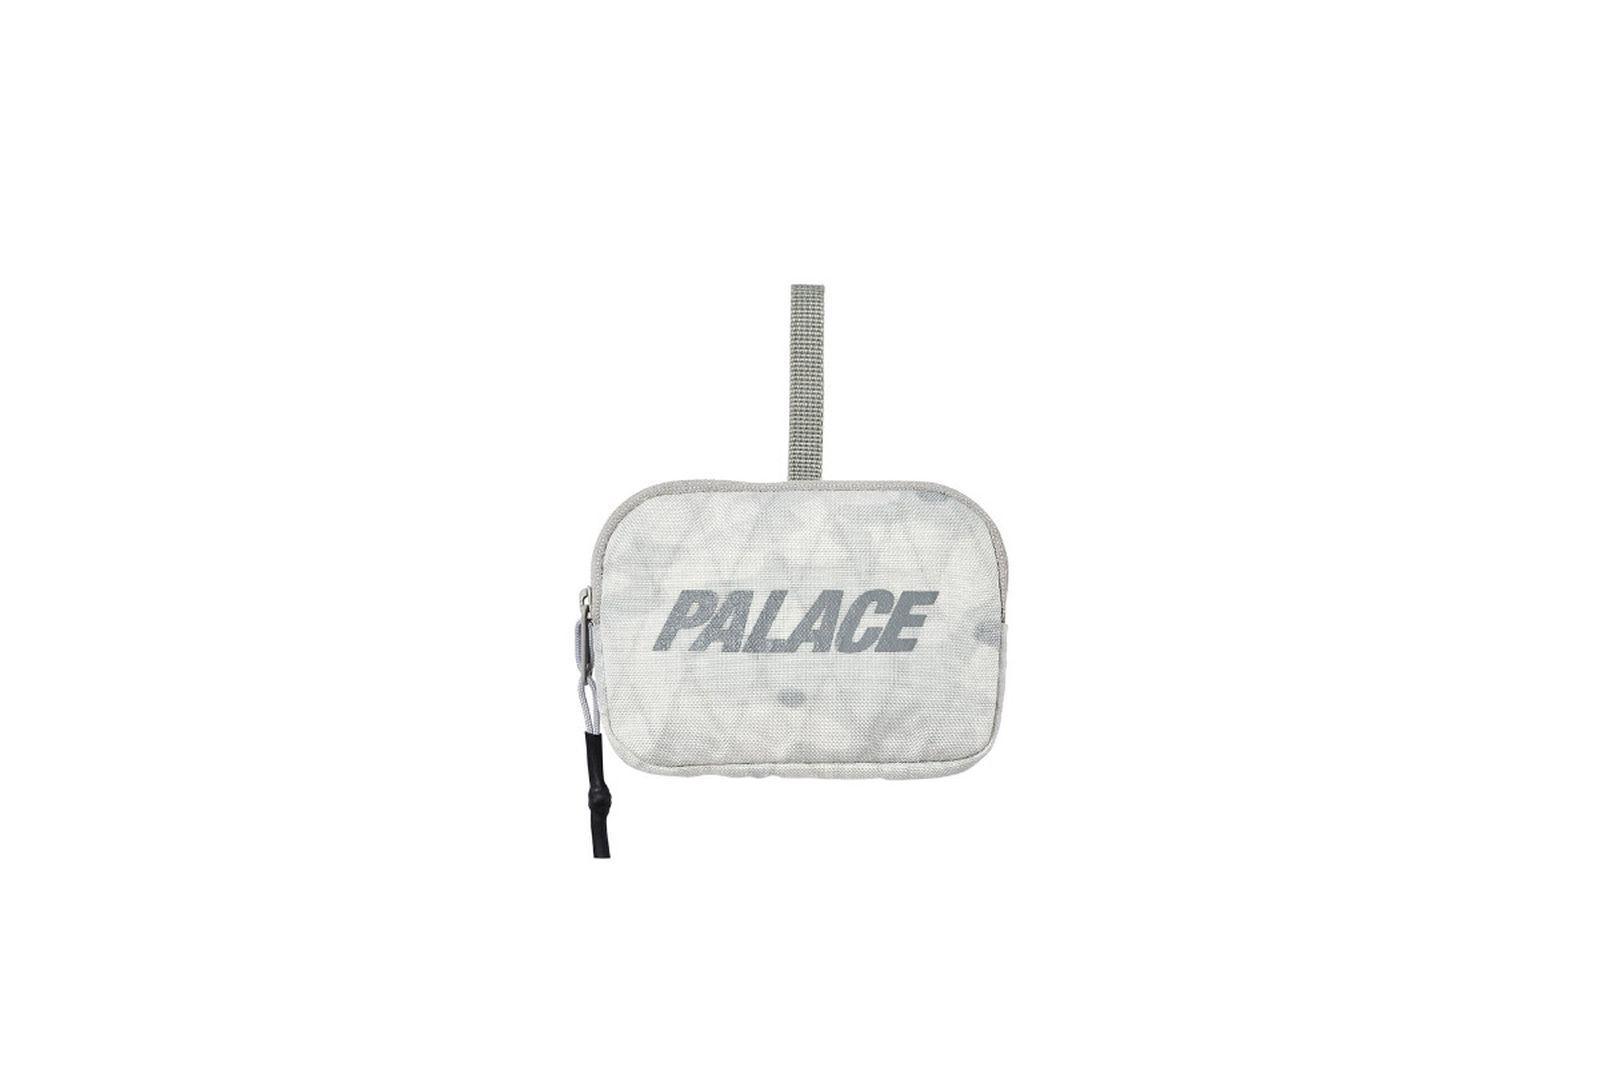 Palace 2019 Autumn Bag Flip Stash camo white 1995 TWEAKED